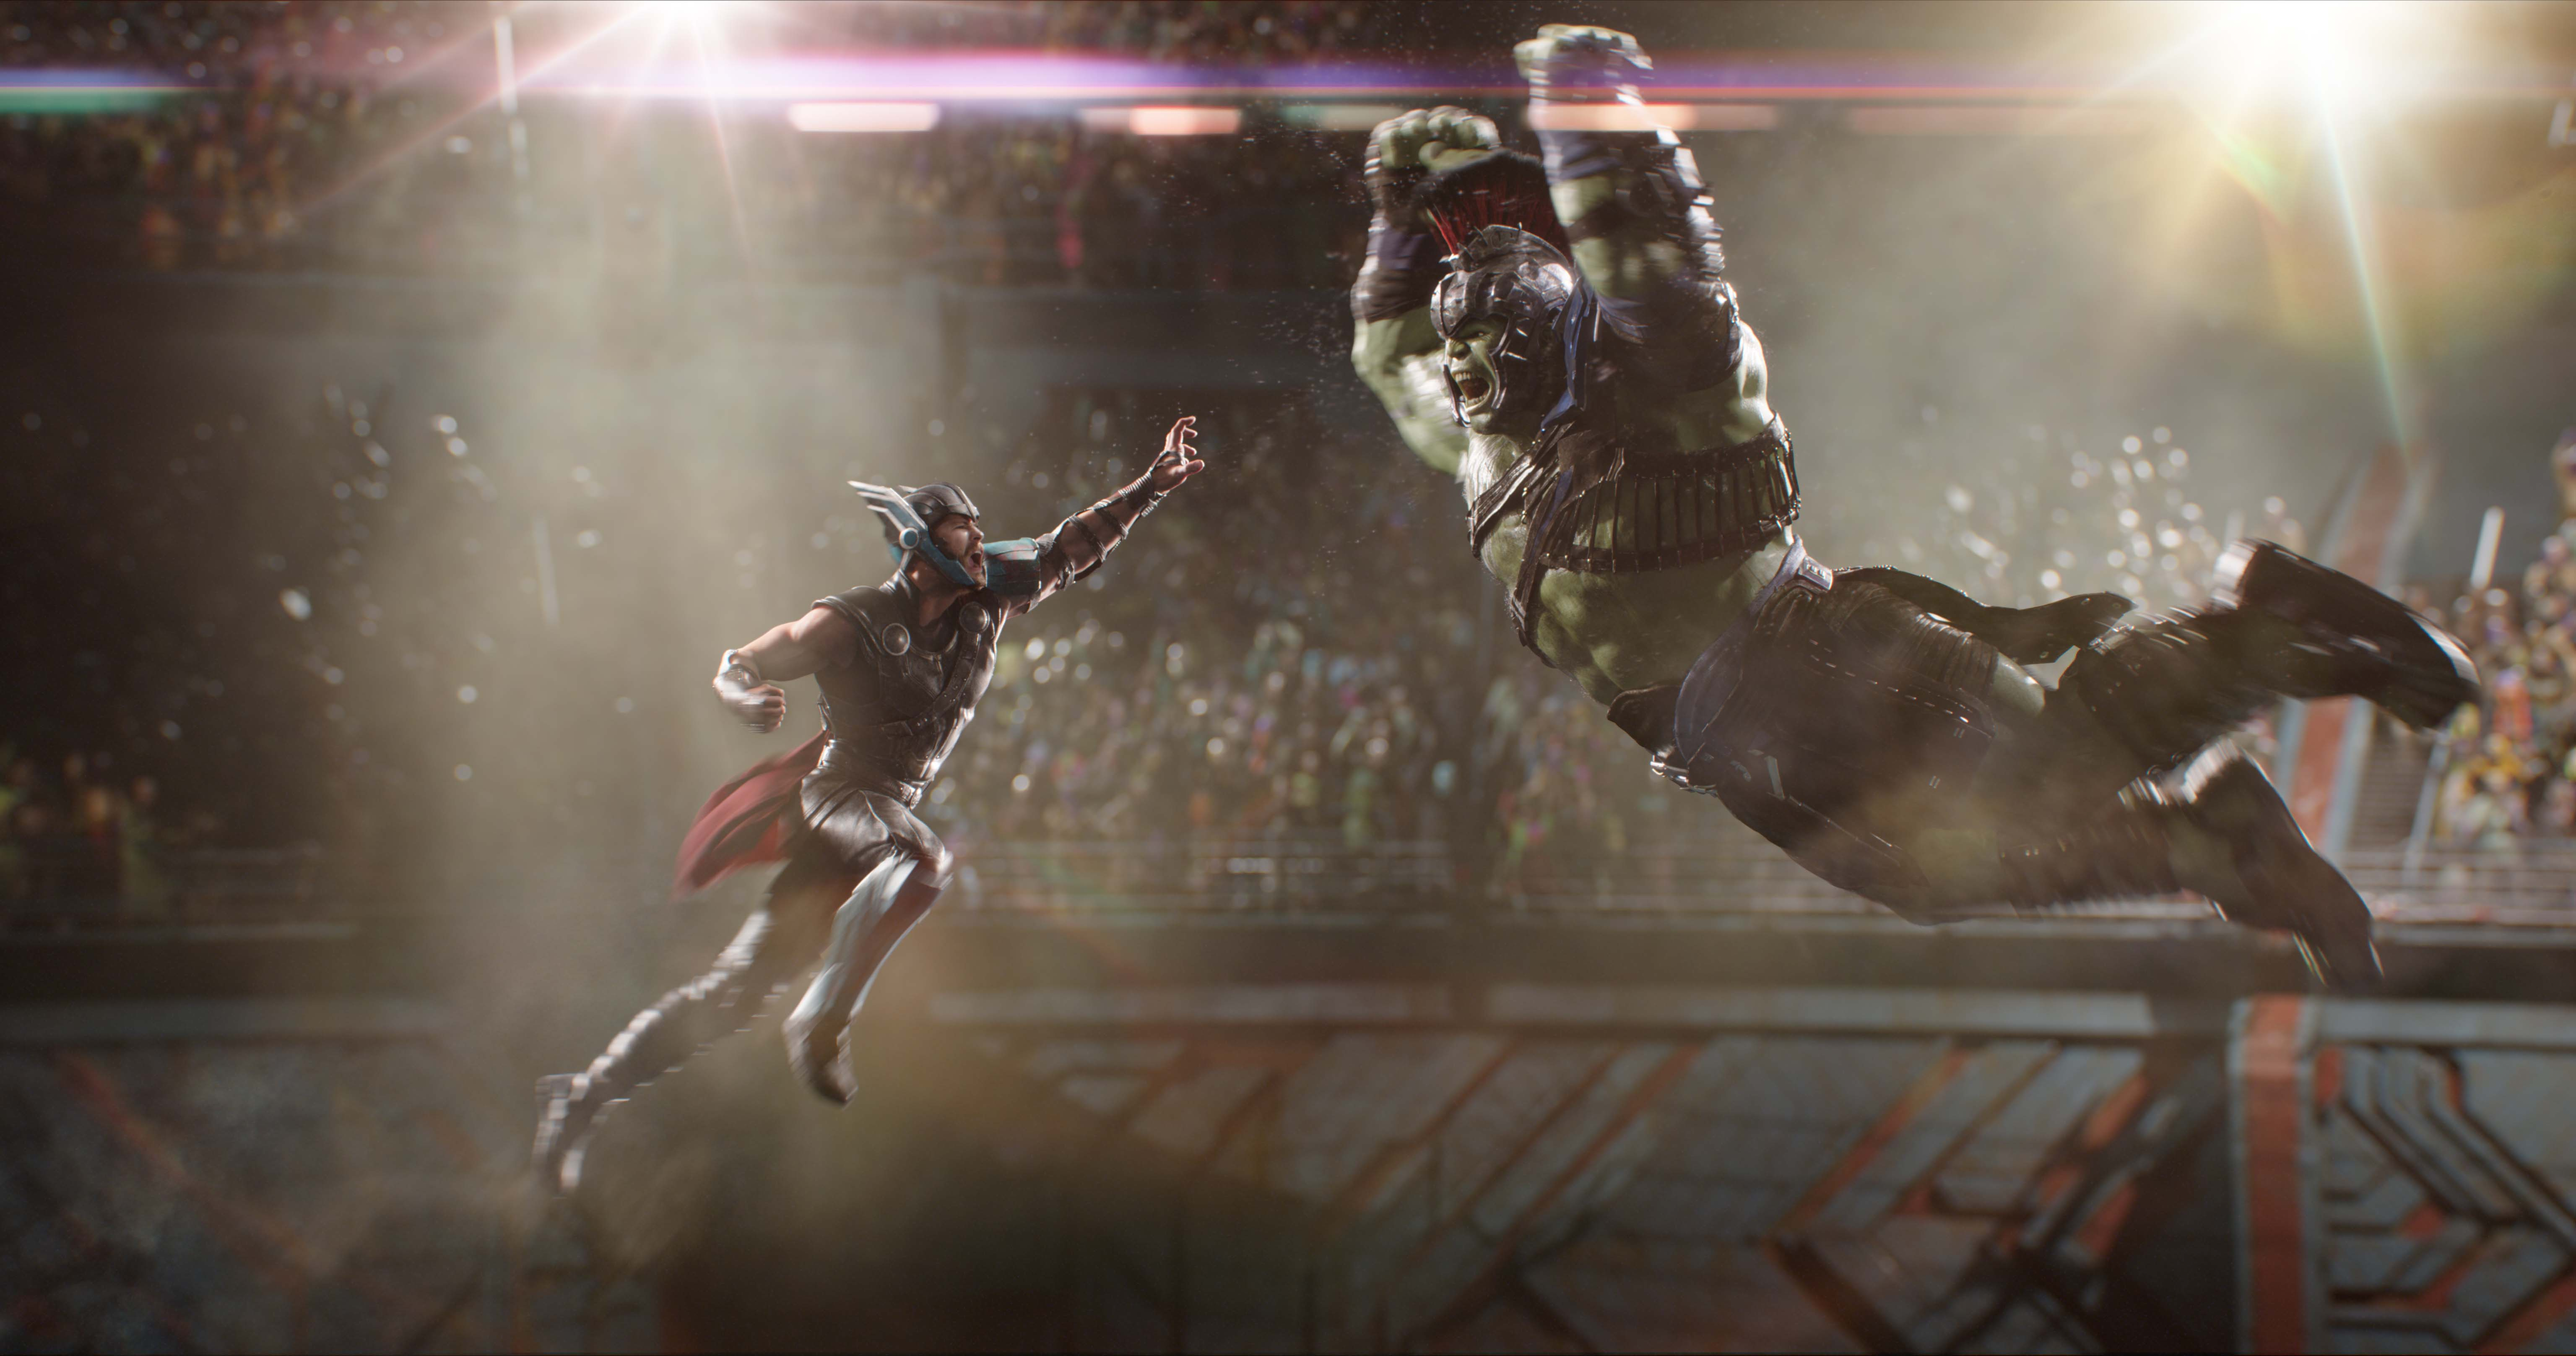 Photo du film Thor: Ragnarok avec Thor face à Hulk